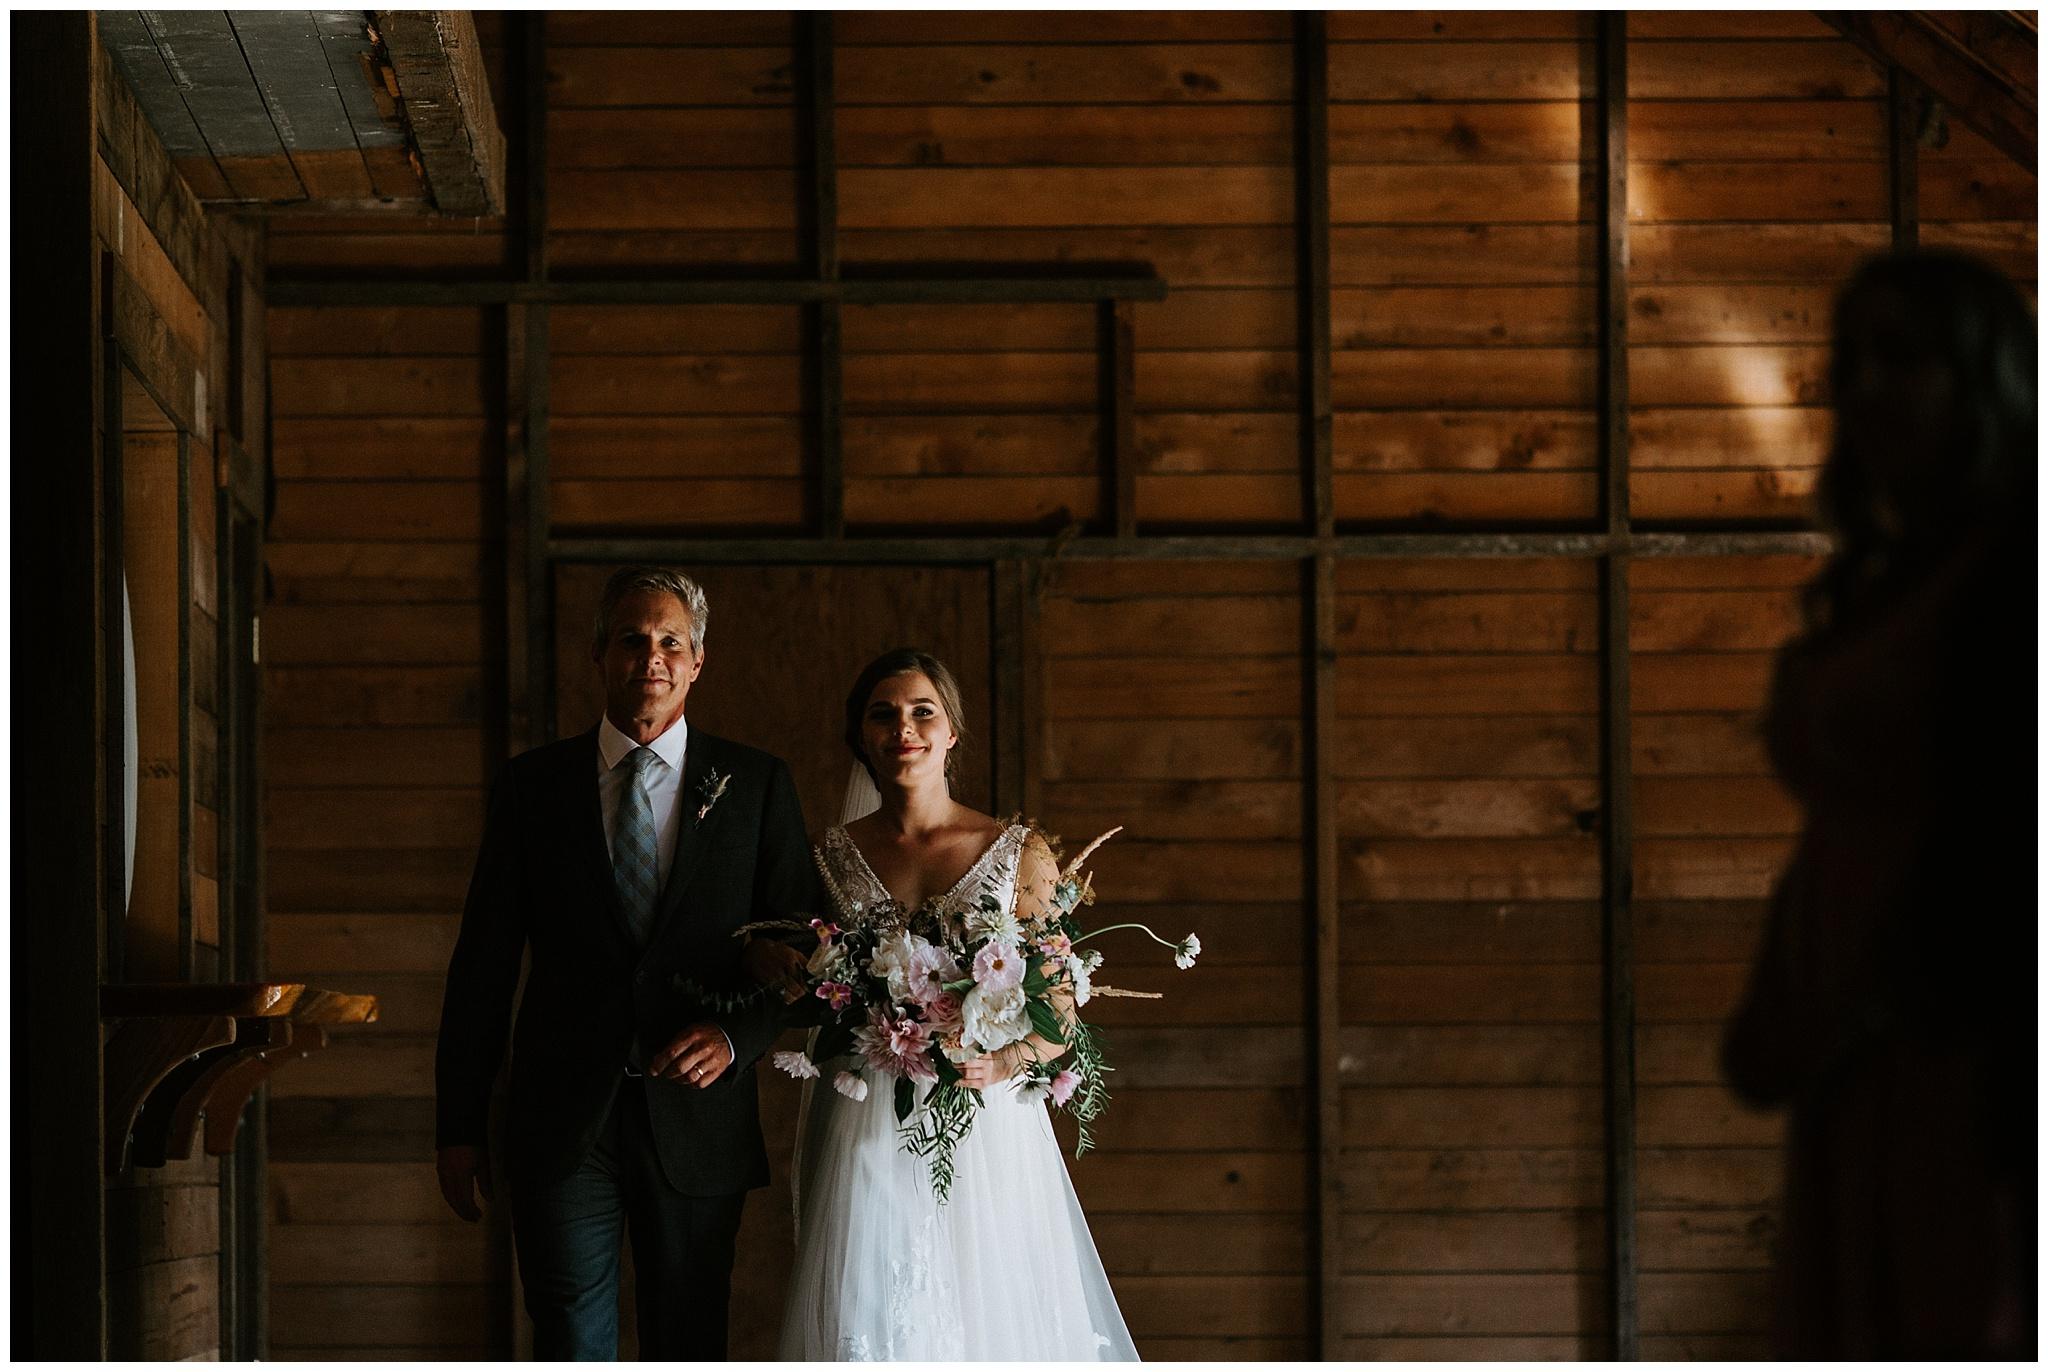 estate-248-wedding-langley-022.JPG